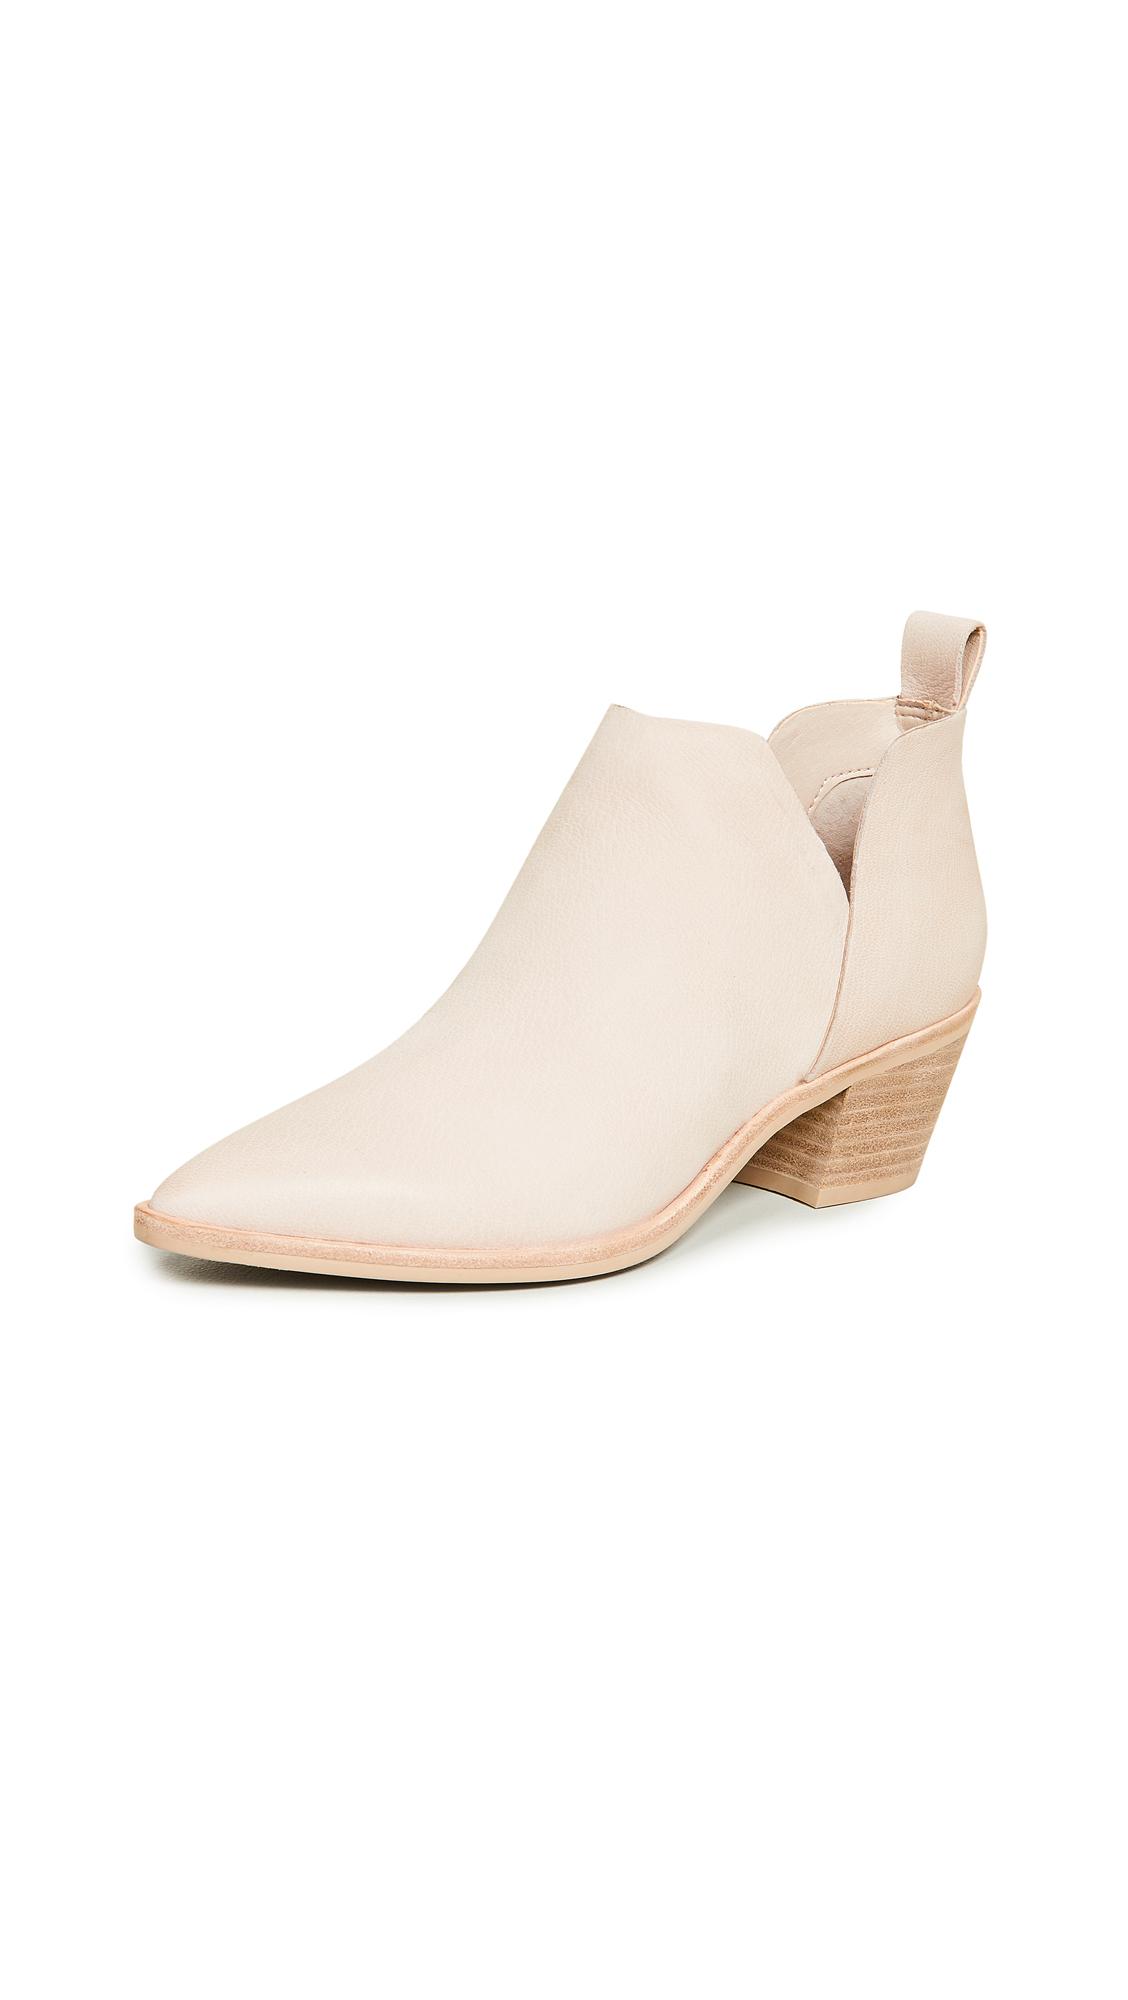 Dolce Vita Sonni Block Heel Booties - Sand